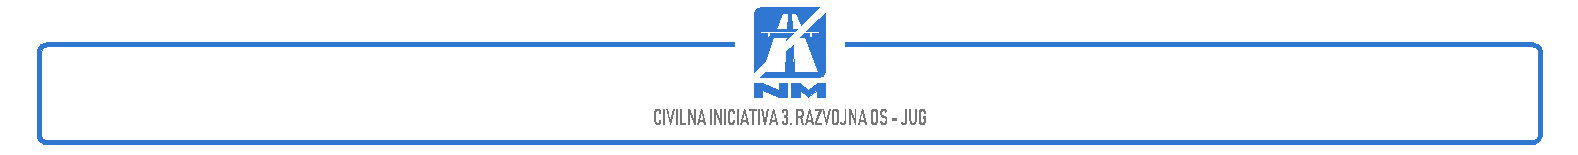 Civilna iniciativa 3. razvojna os – jug